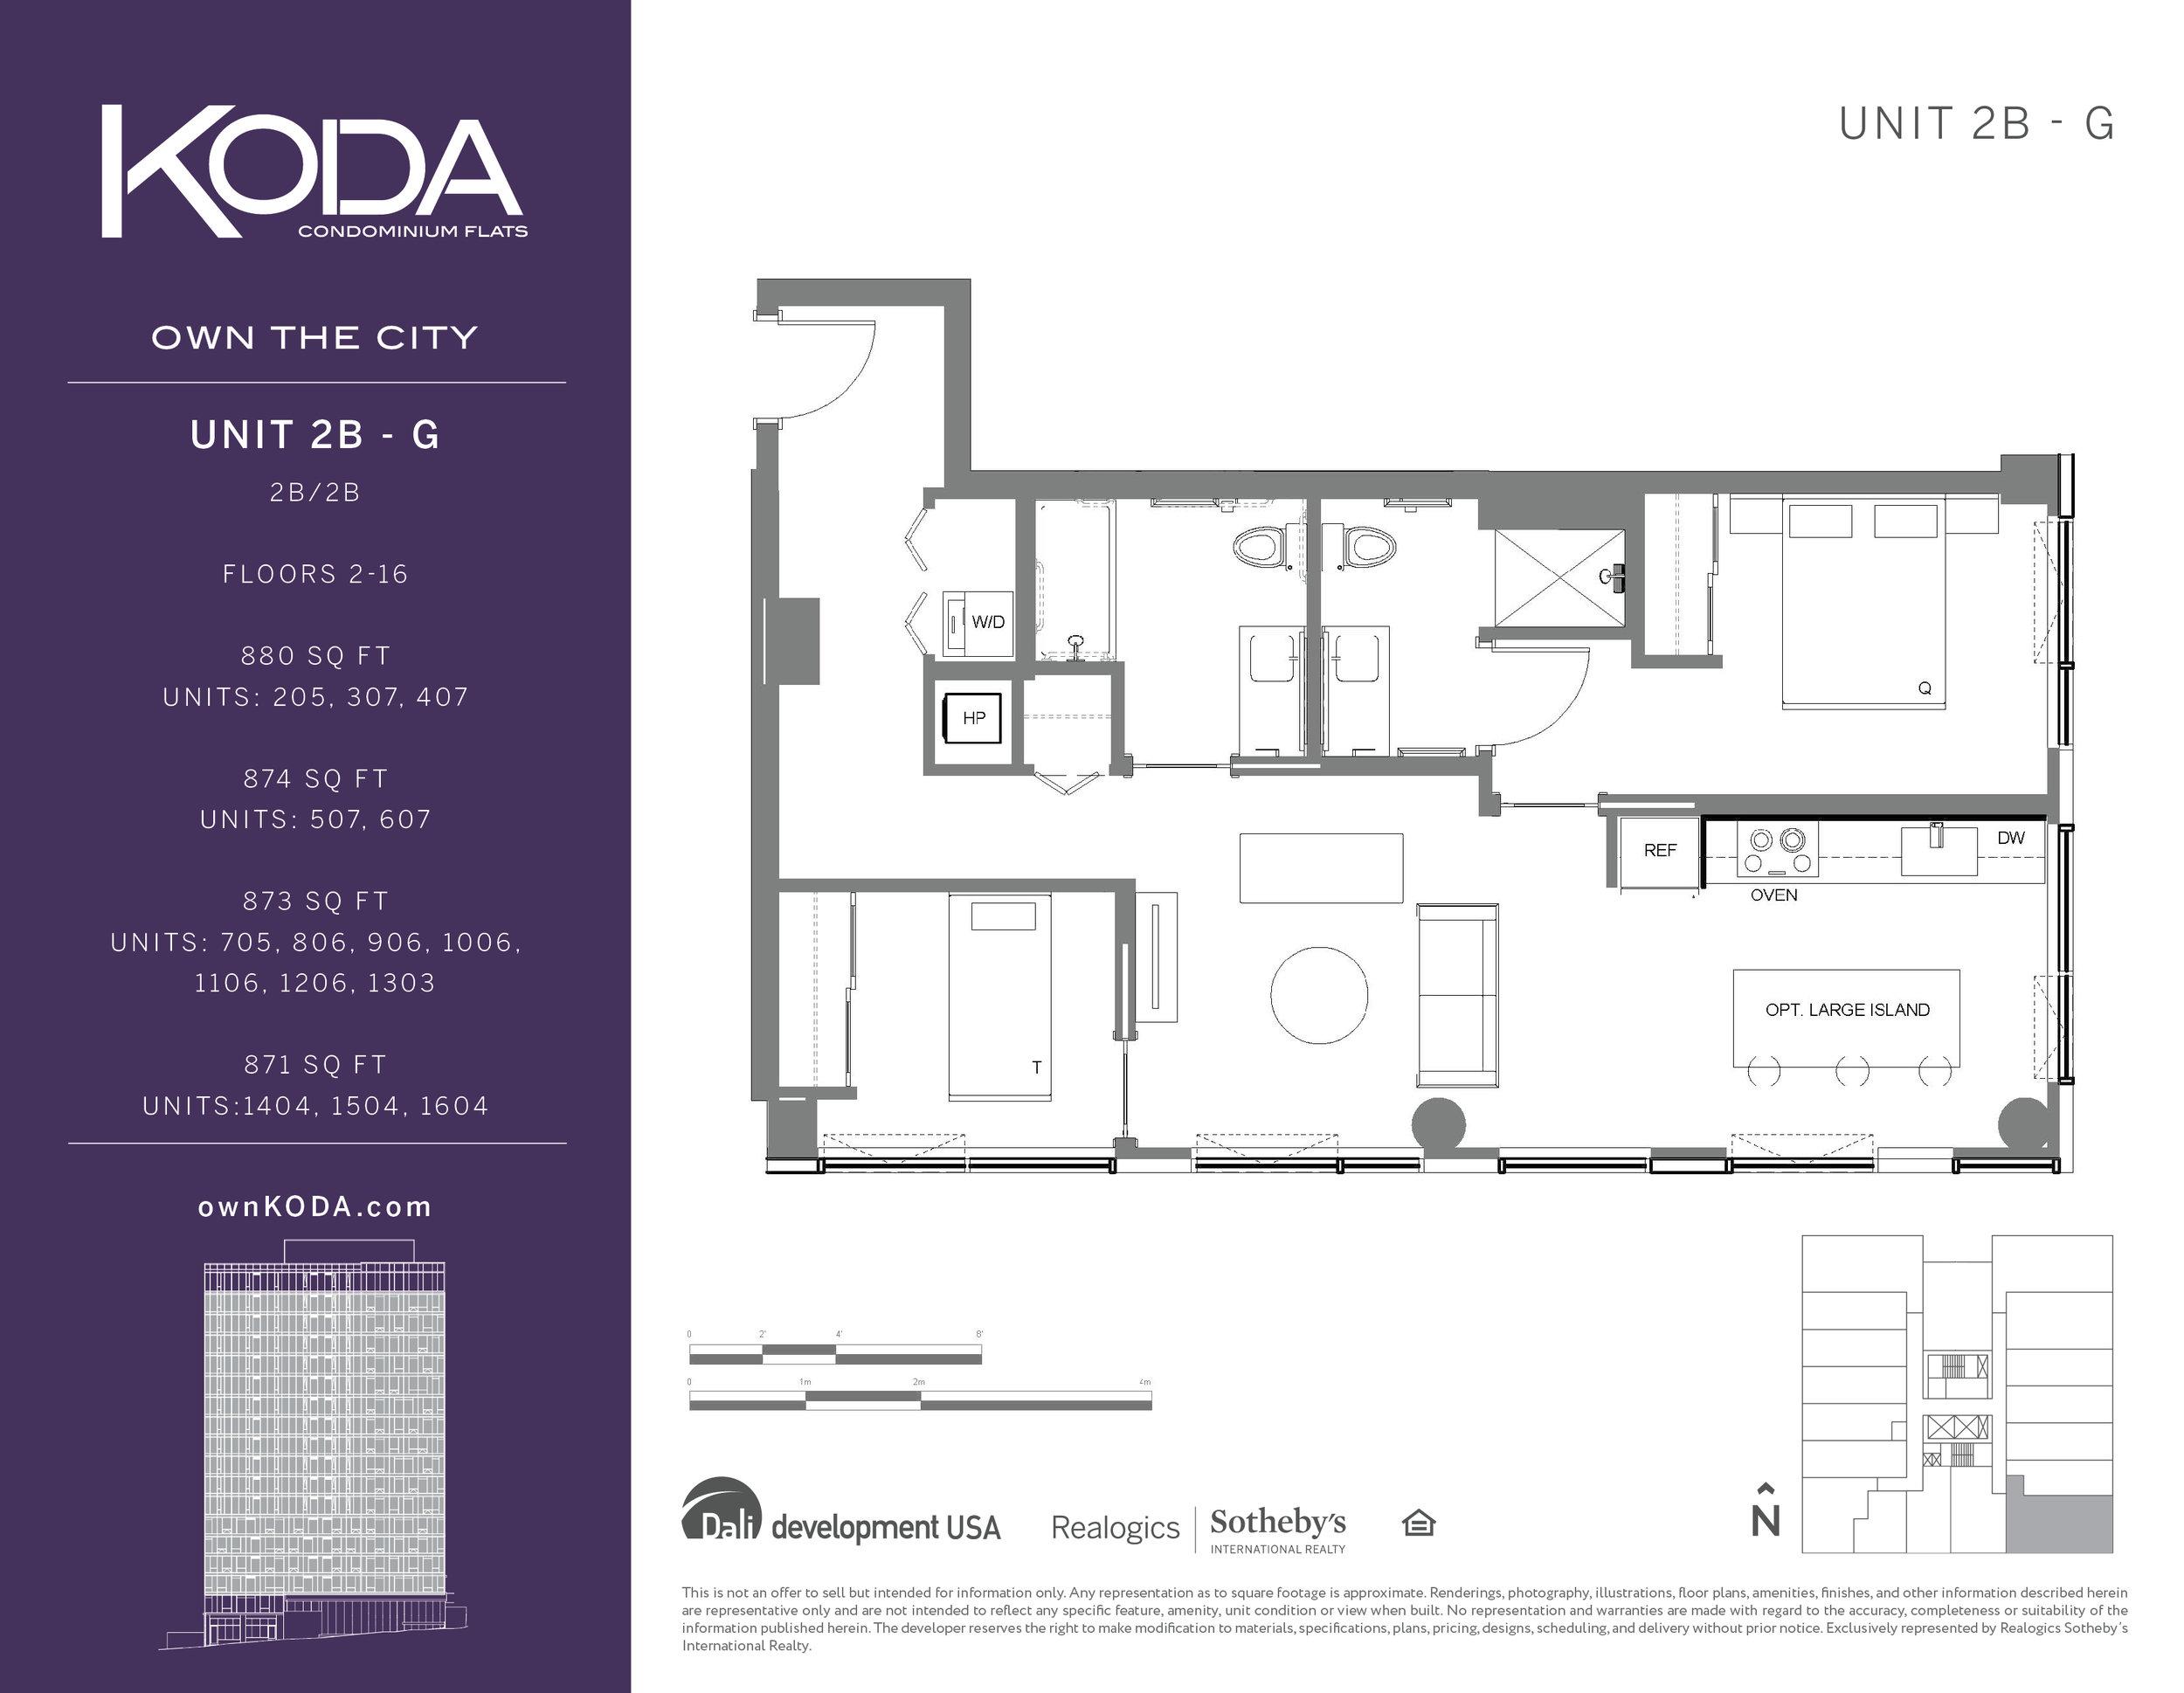 KODA_FloorPlanFlyer_Update_Approved_04.04.19_Release33.jpg